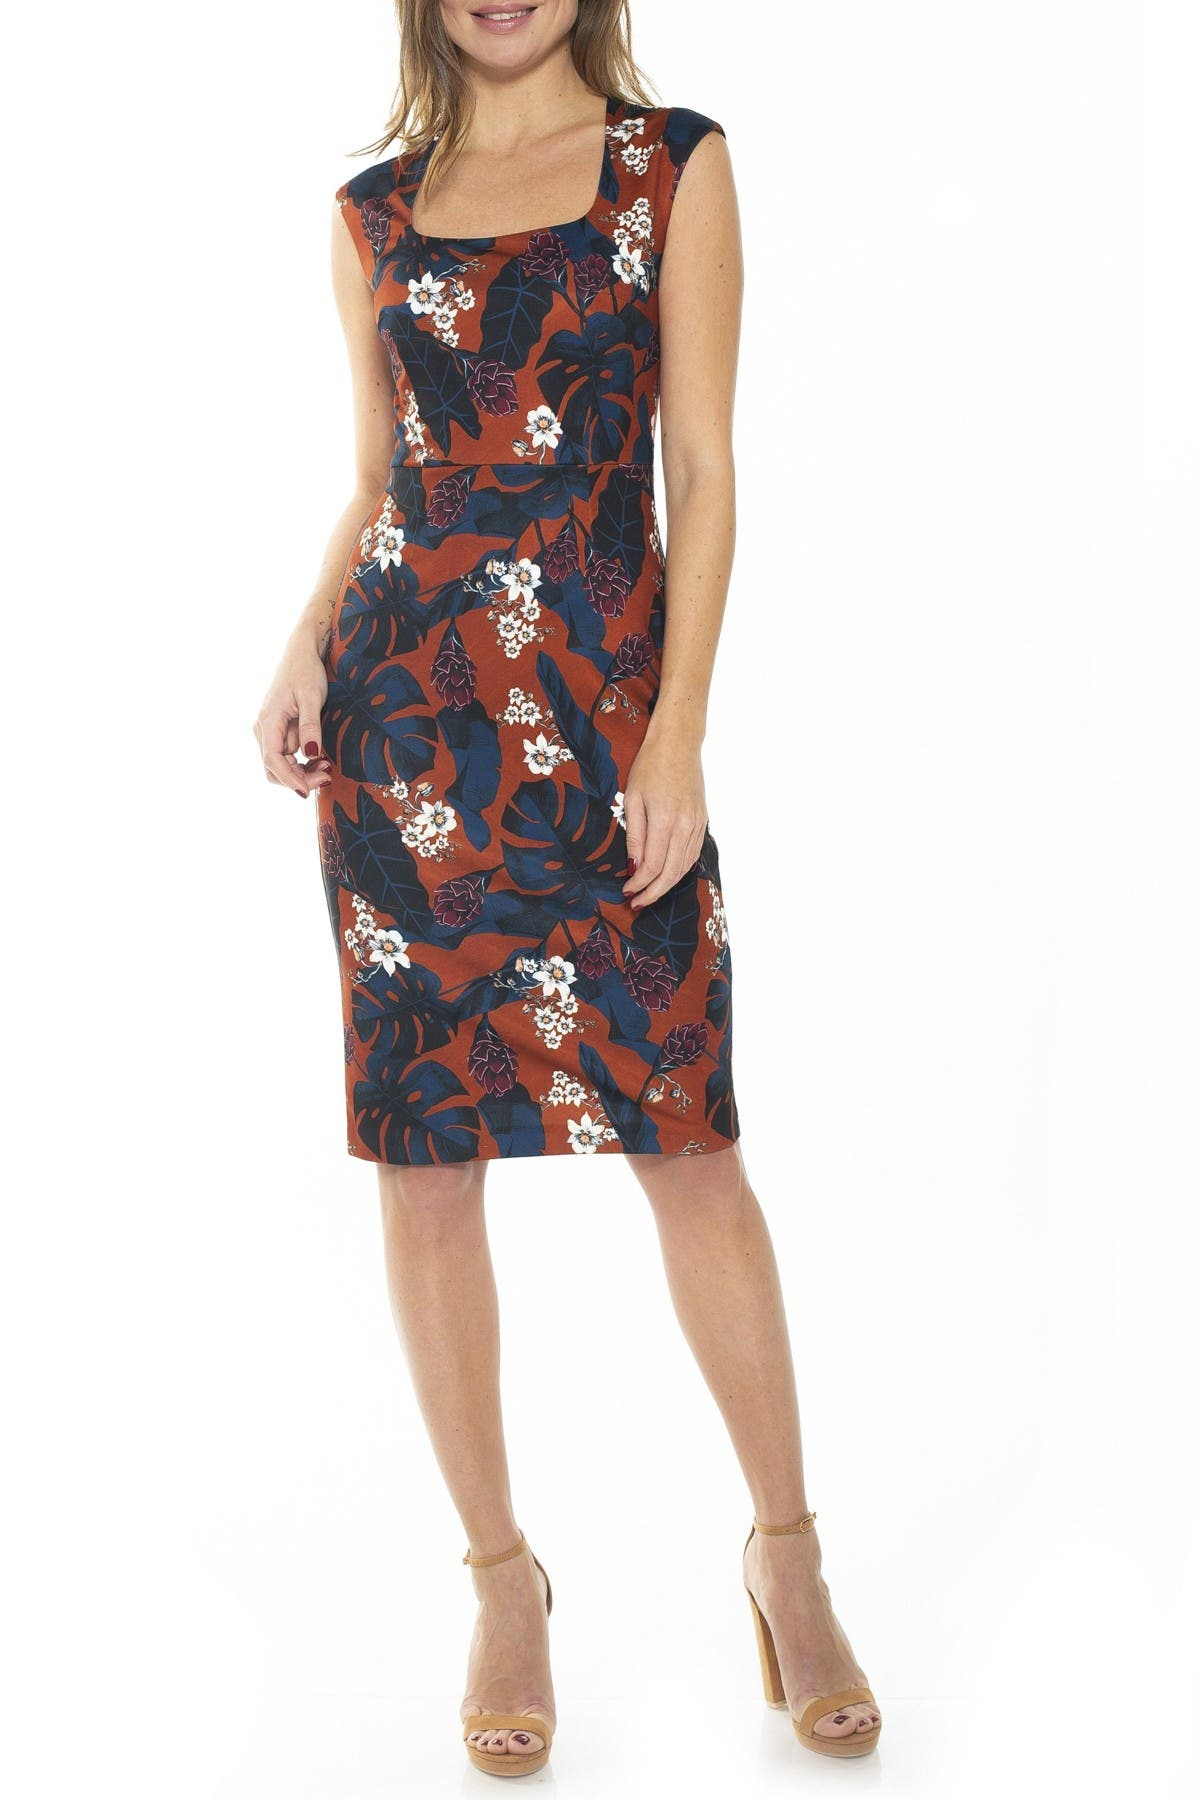 Image of Alexia Admor Ariana Scoop Neck Sheath Dress